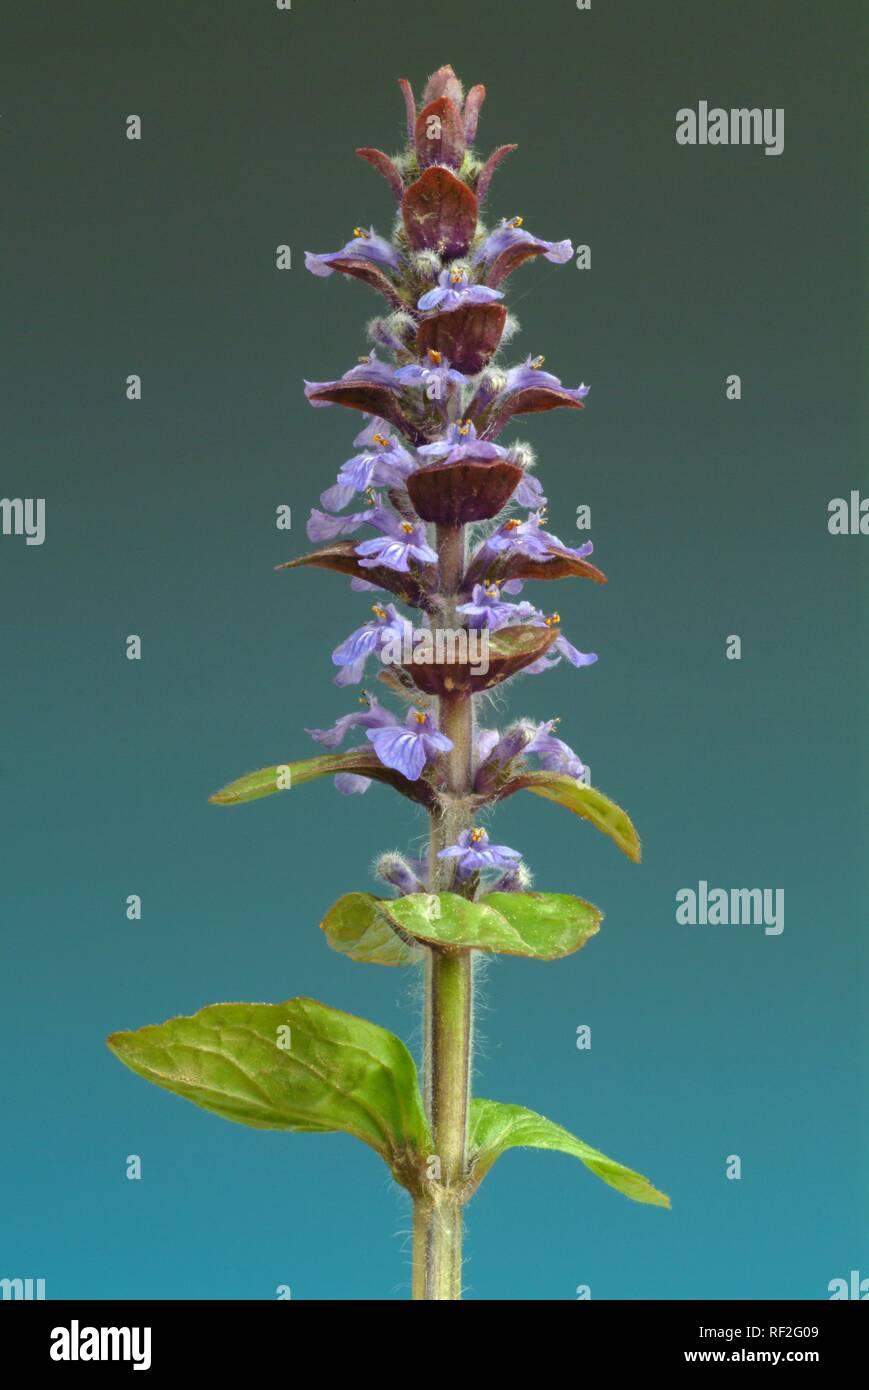 Blue Bugle, Bugleherb, Bugleweed or Carpetweed (Ajuga reptans), medicinal plant Stock Photo